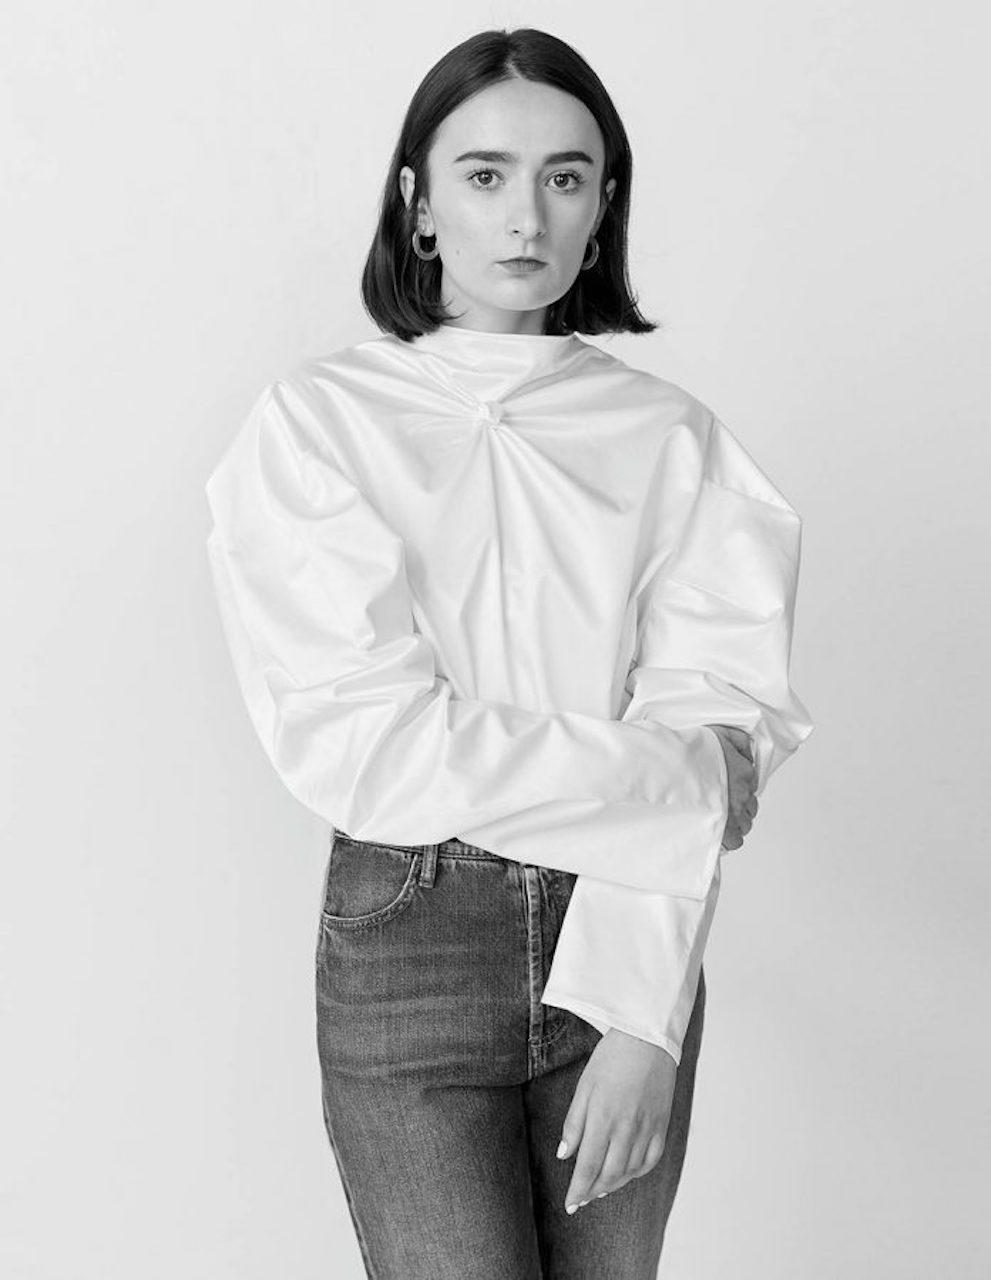 Oana Barbonie, Harper's BAZAAR pic